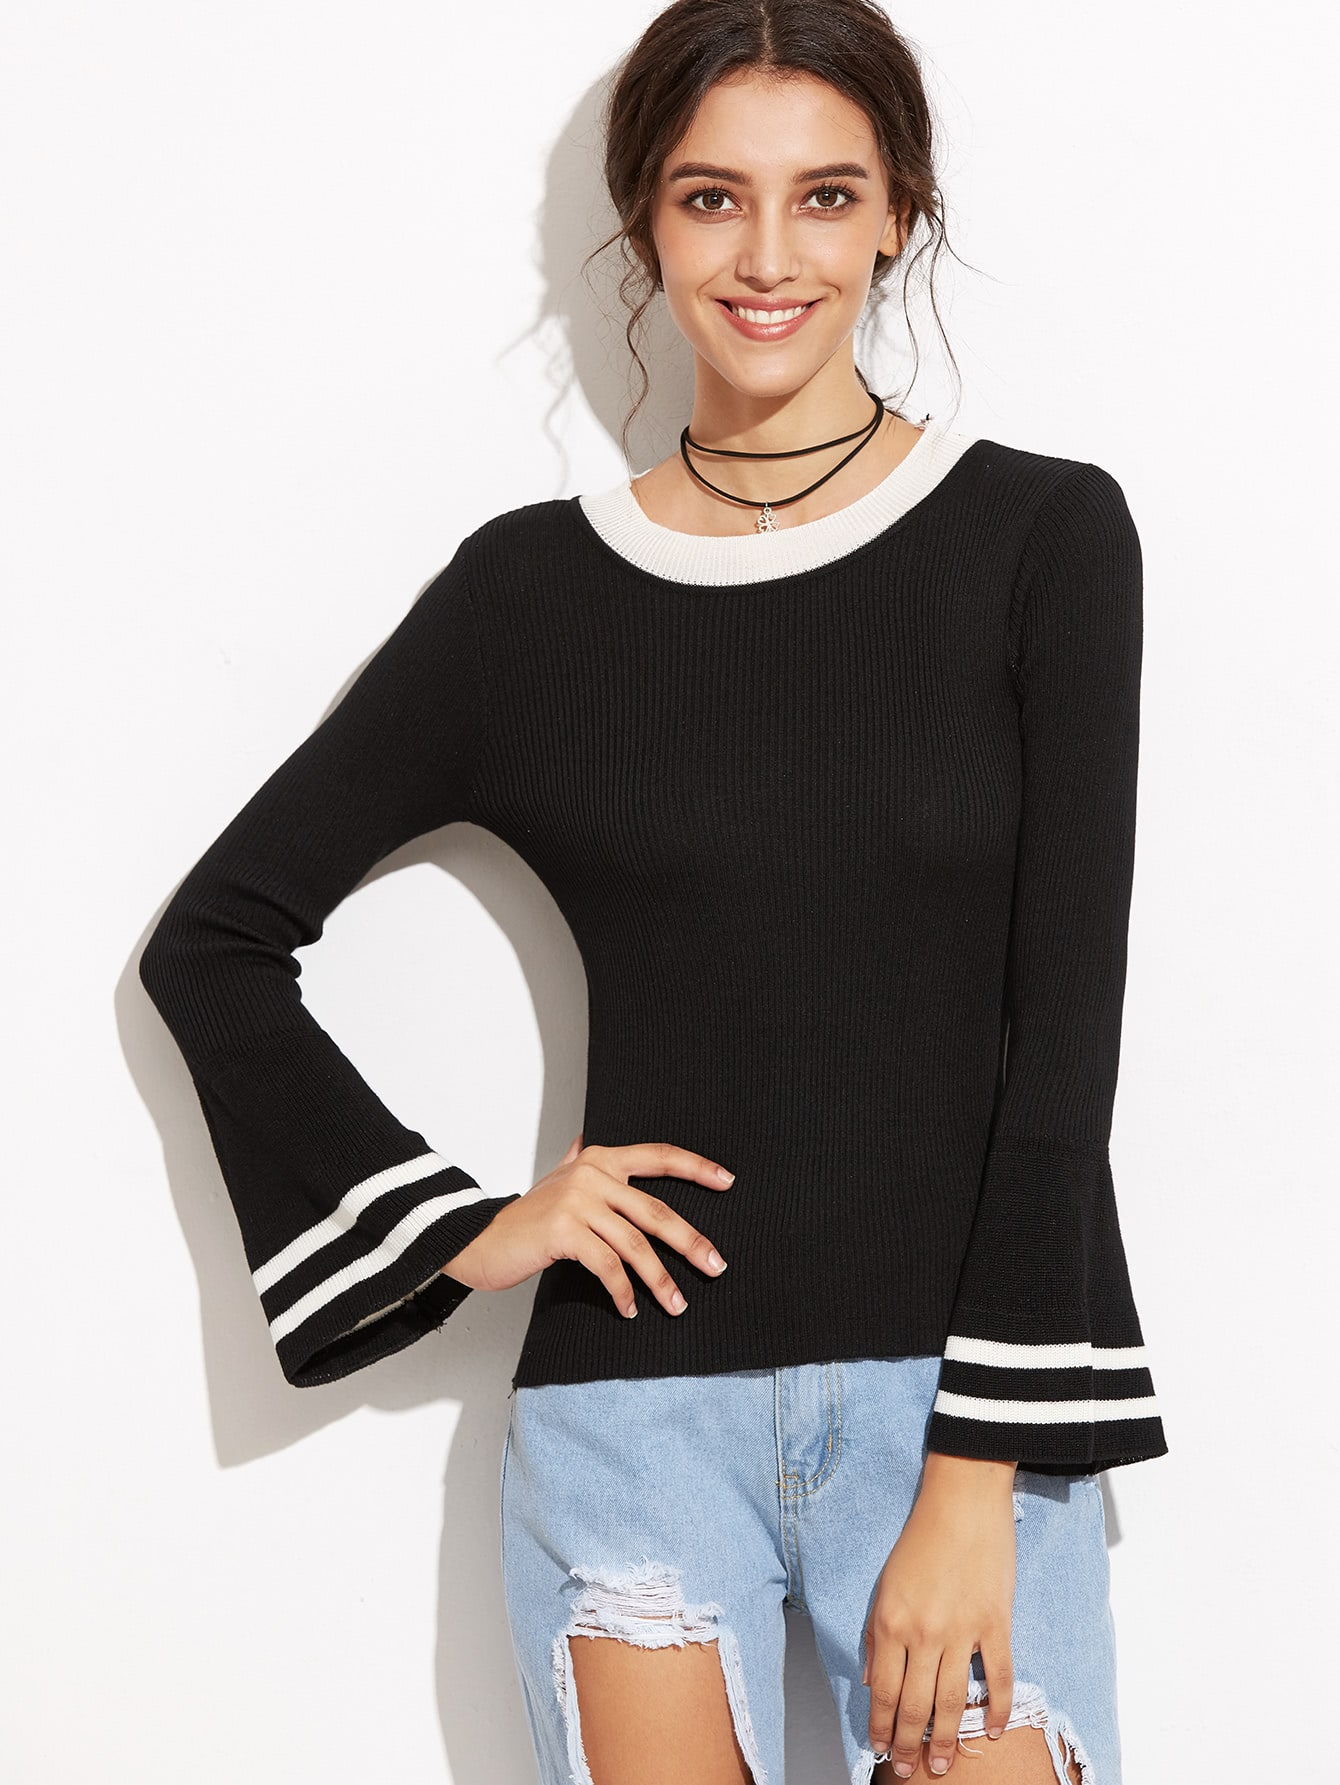 Black Bell Sleeve Contrast Trim Sweater sweater160901001